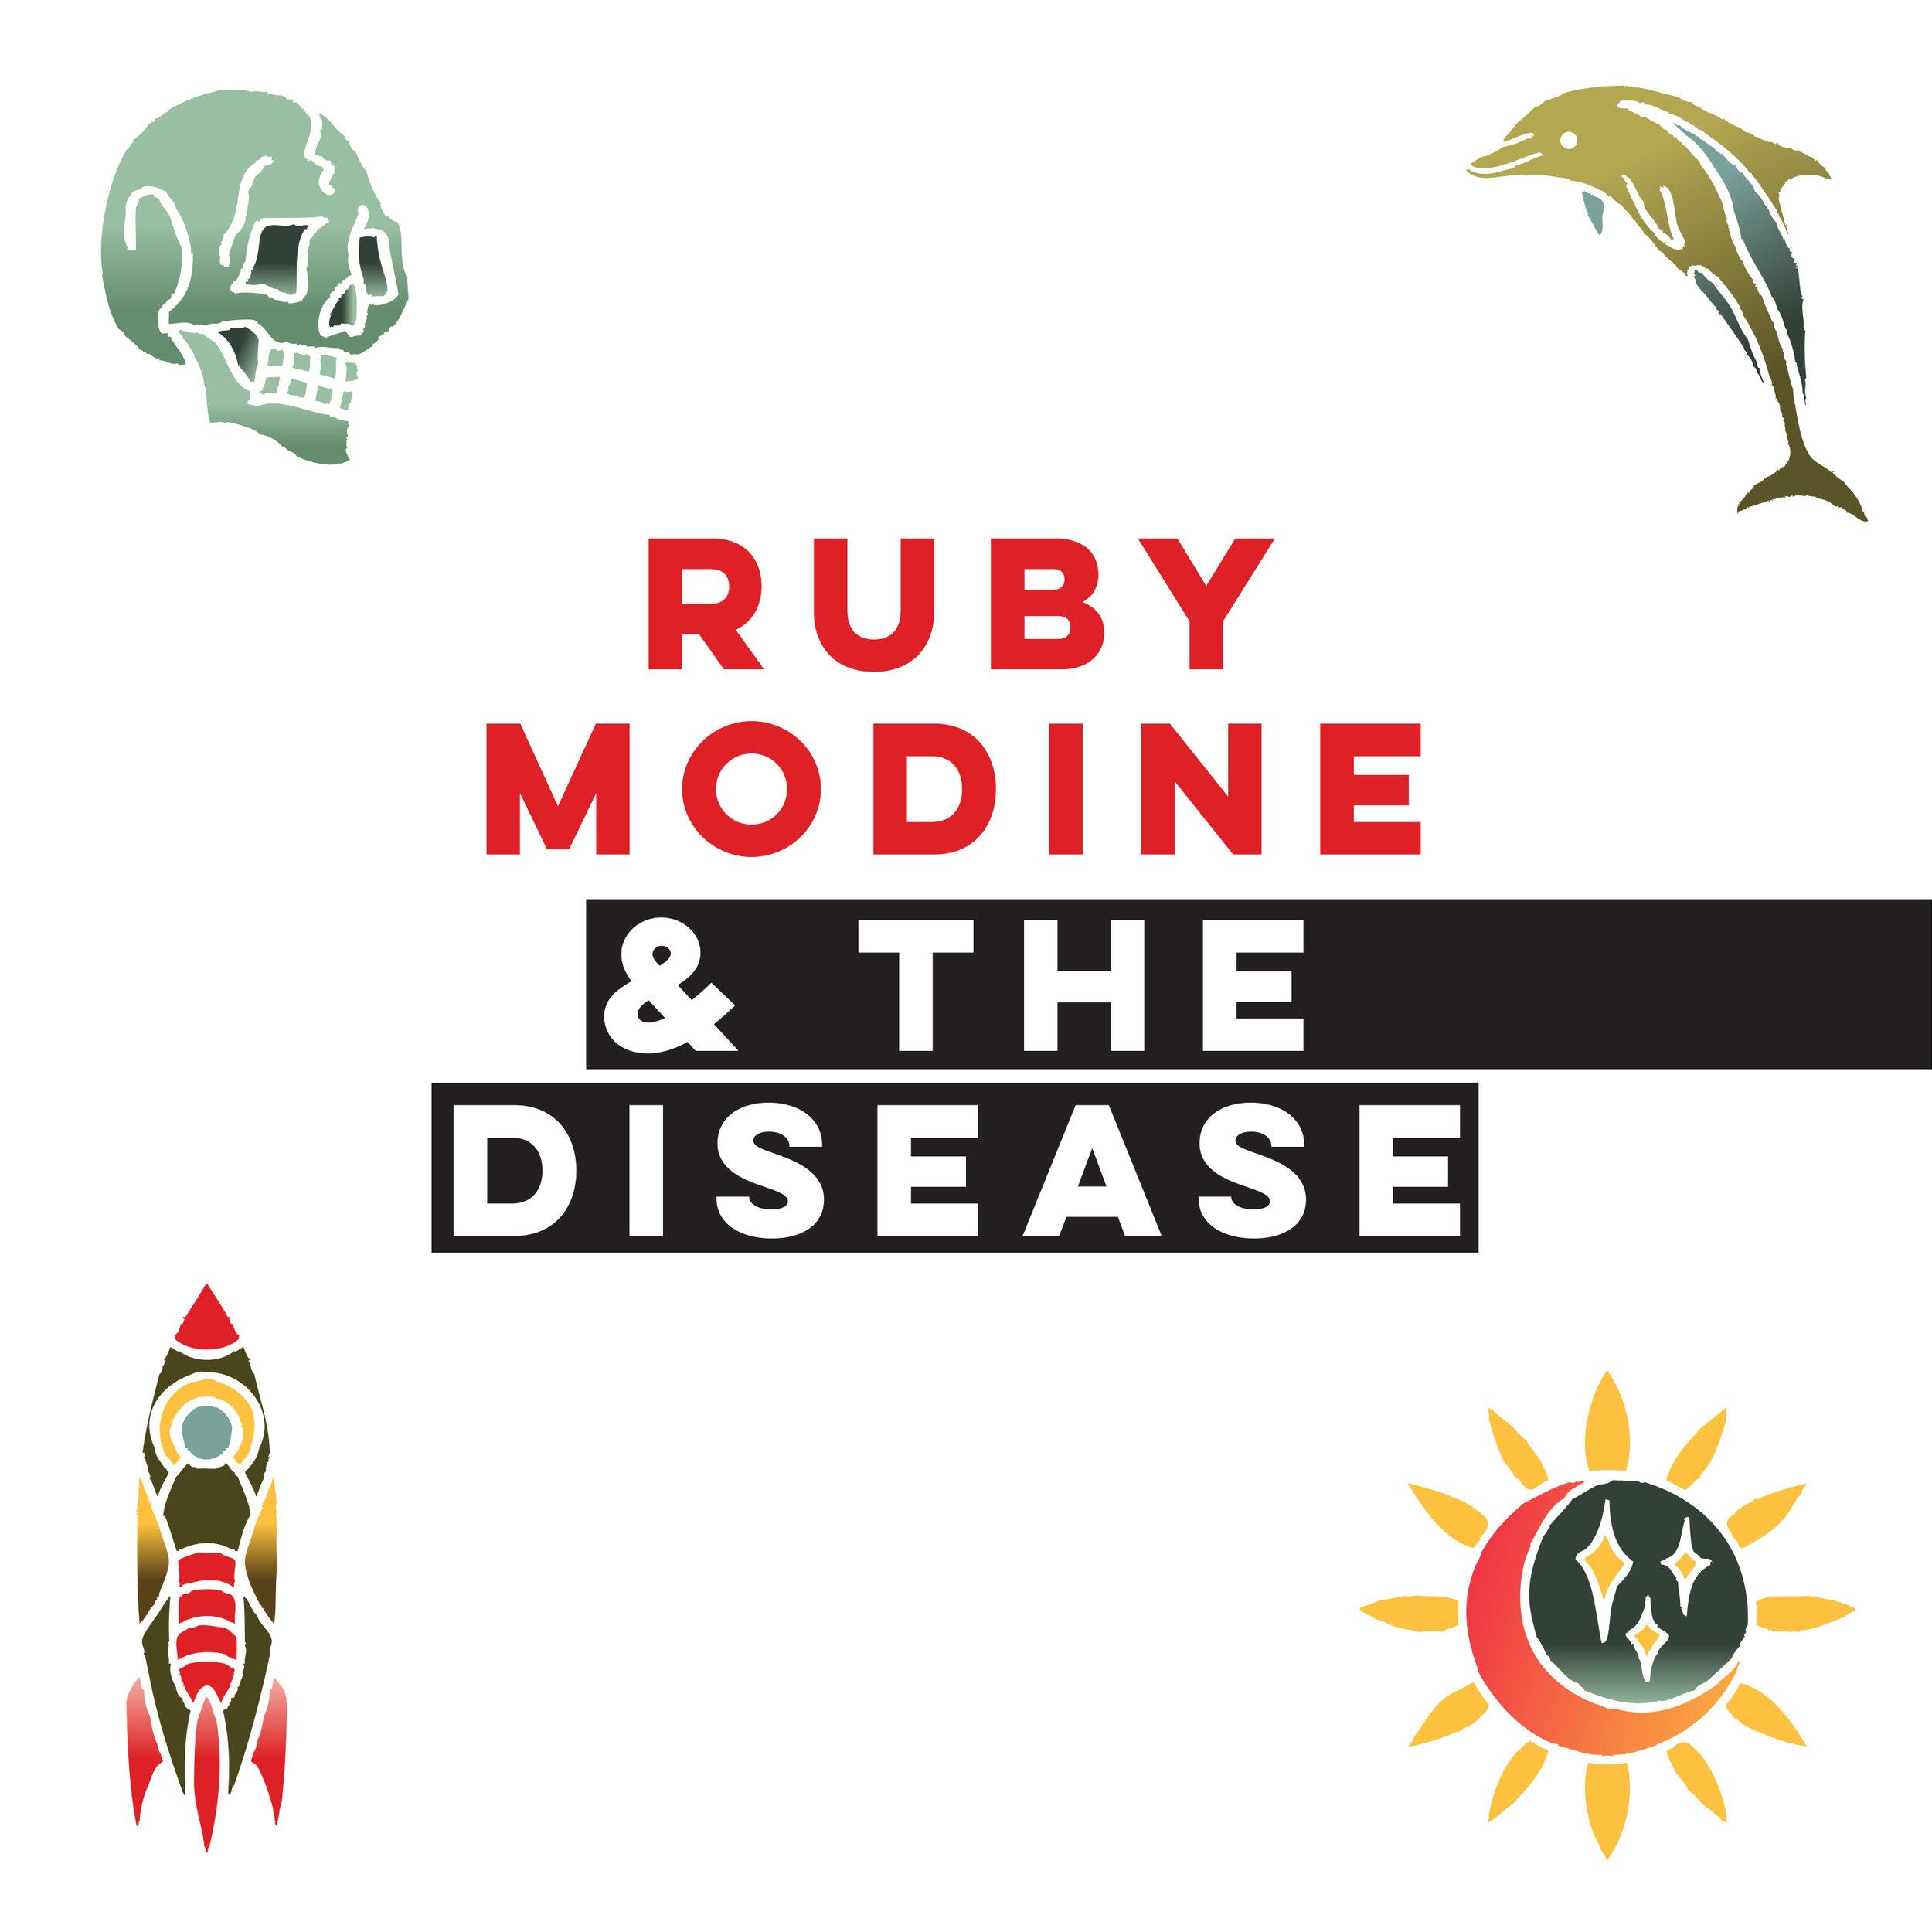 RUBY MODINE & THE DISEASE